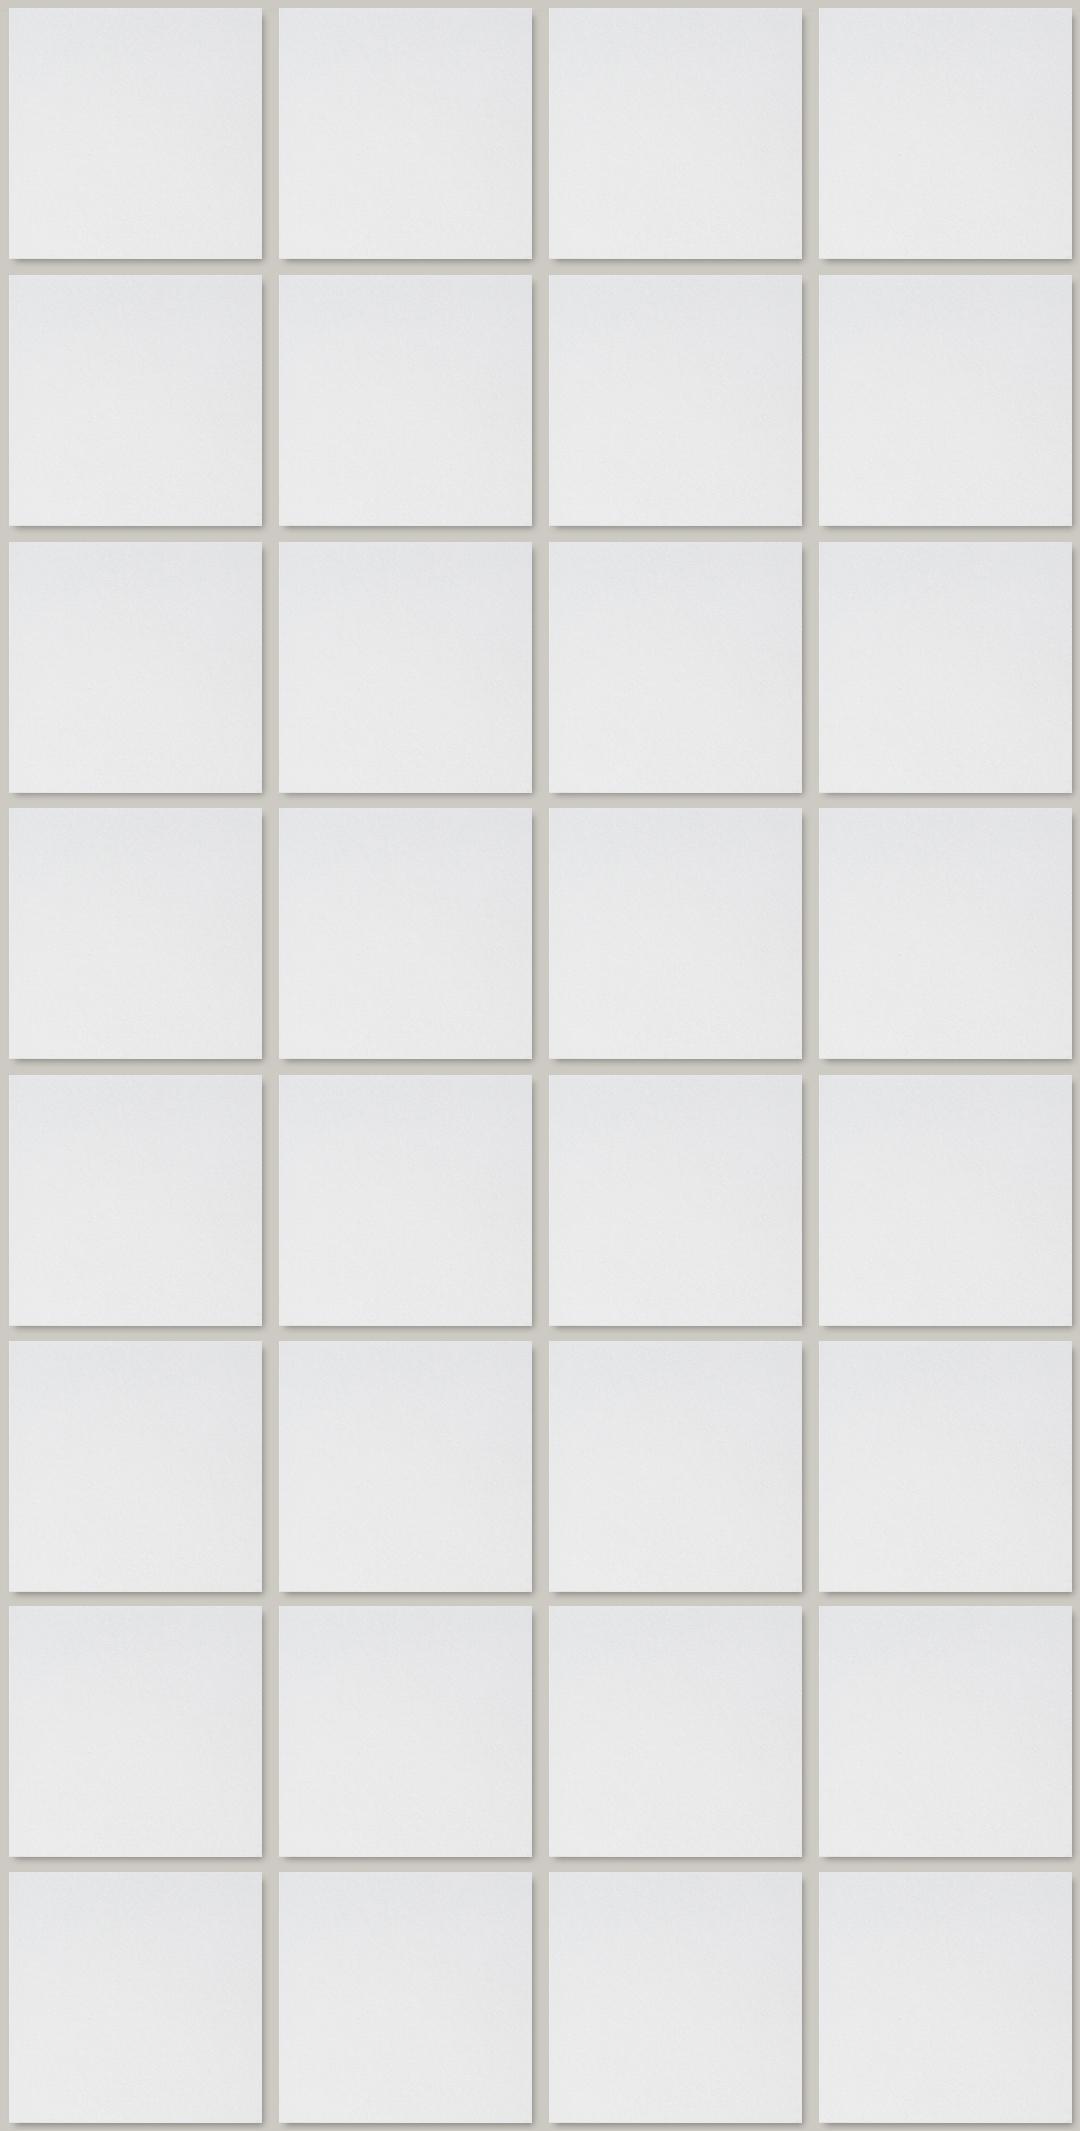 Charming 1 X 1 Acoustic Ceiling Tiles Thin 12X12 Ceiling Tiles Lowes Regular 2X4 Ceiling Tile 3D Glass Tile Backsplash Youthful 6 Inch Tile Backsplash Soft6 X 24 Floor Tile Armstrong Ultima 1911 Ceiling Tile   Best Ceiling 2018